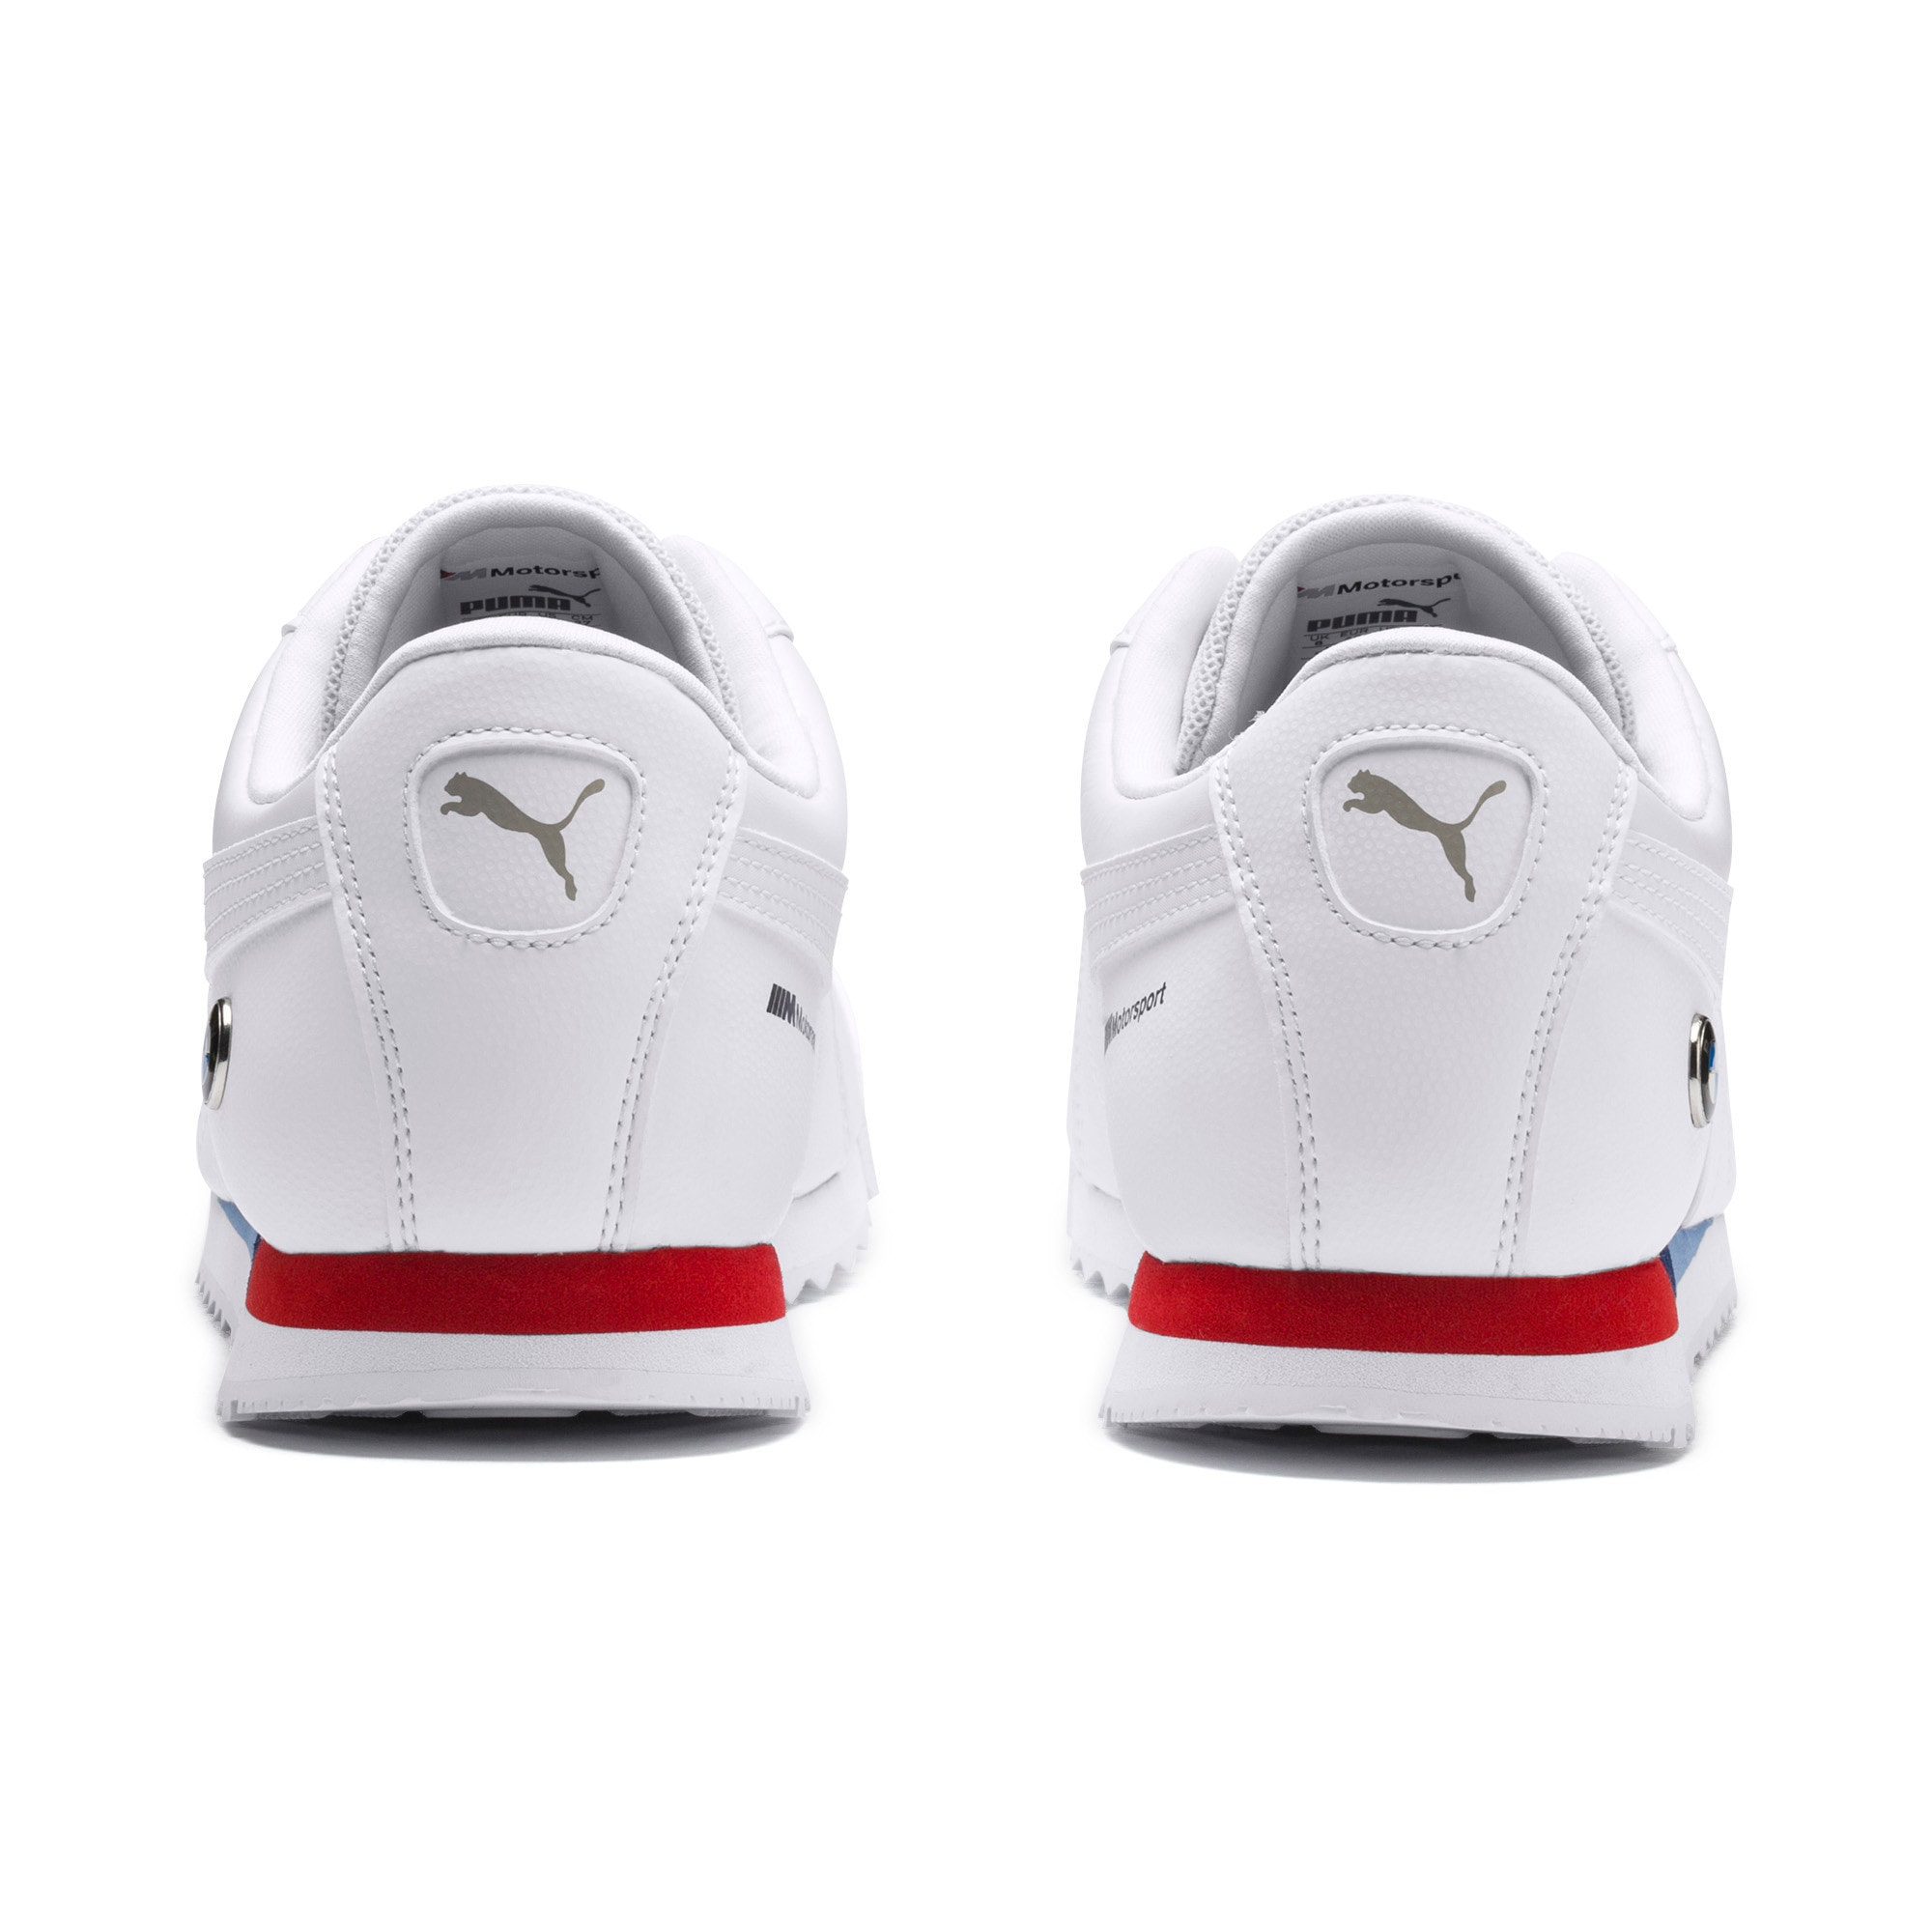 Thumbnail 3 of BMW M Motorsport Roma Men's Sneakers, Puma White-Puma White, medium